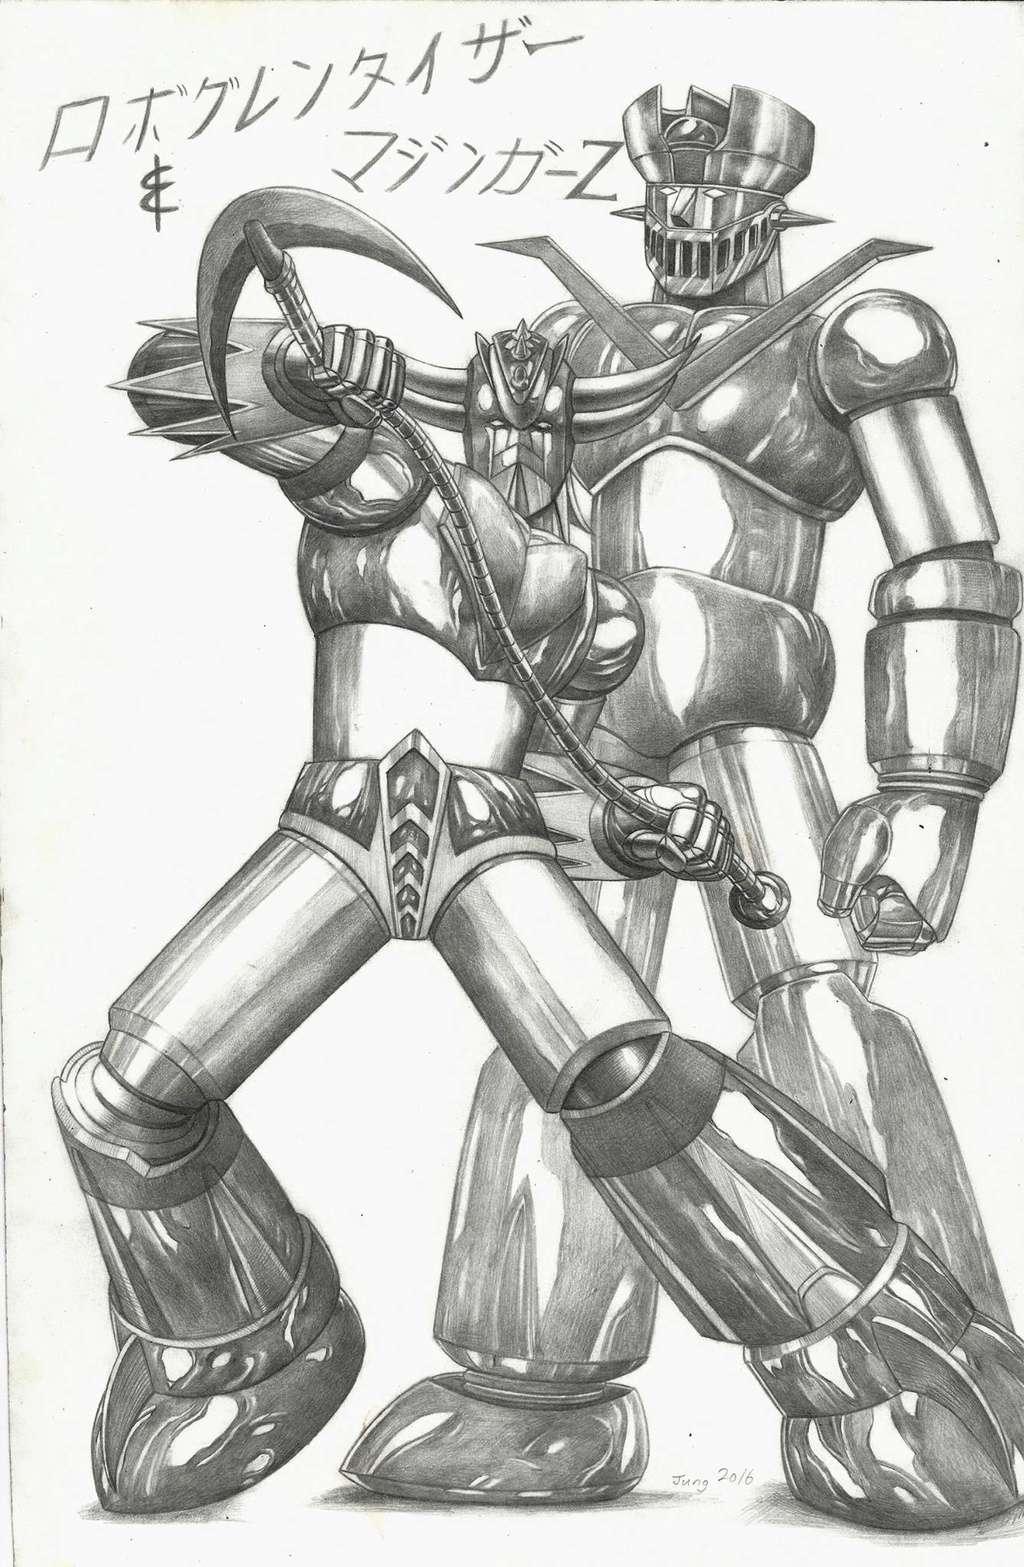 Apres les filles les robots - Page 8 Jung-s10